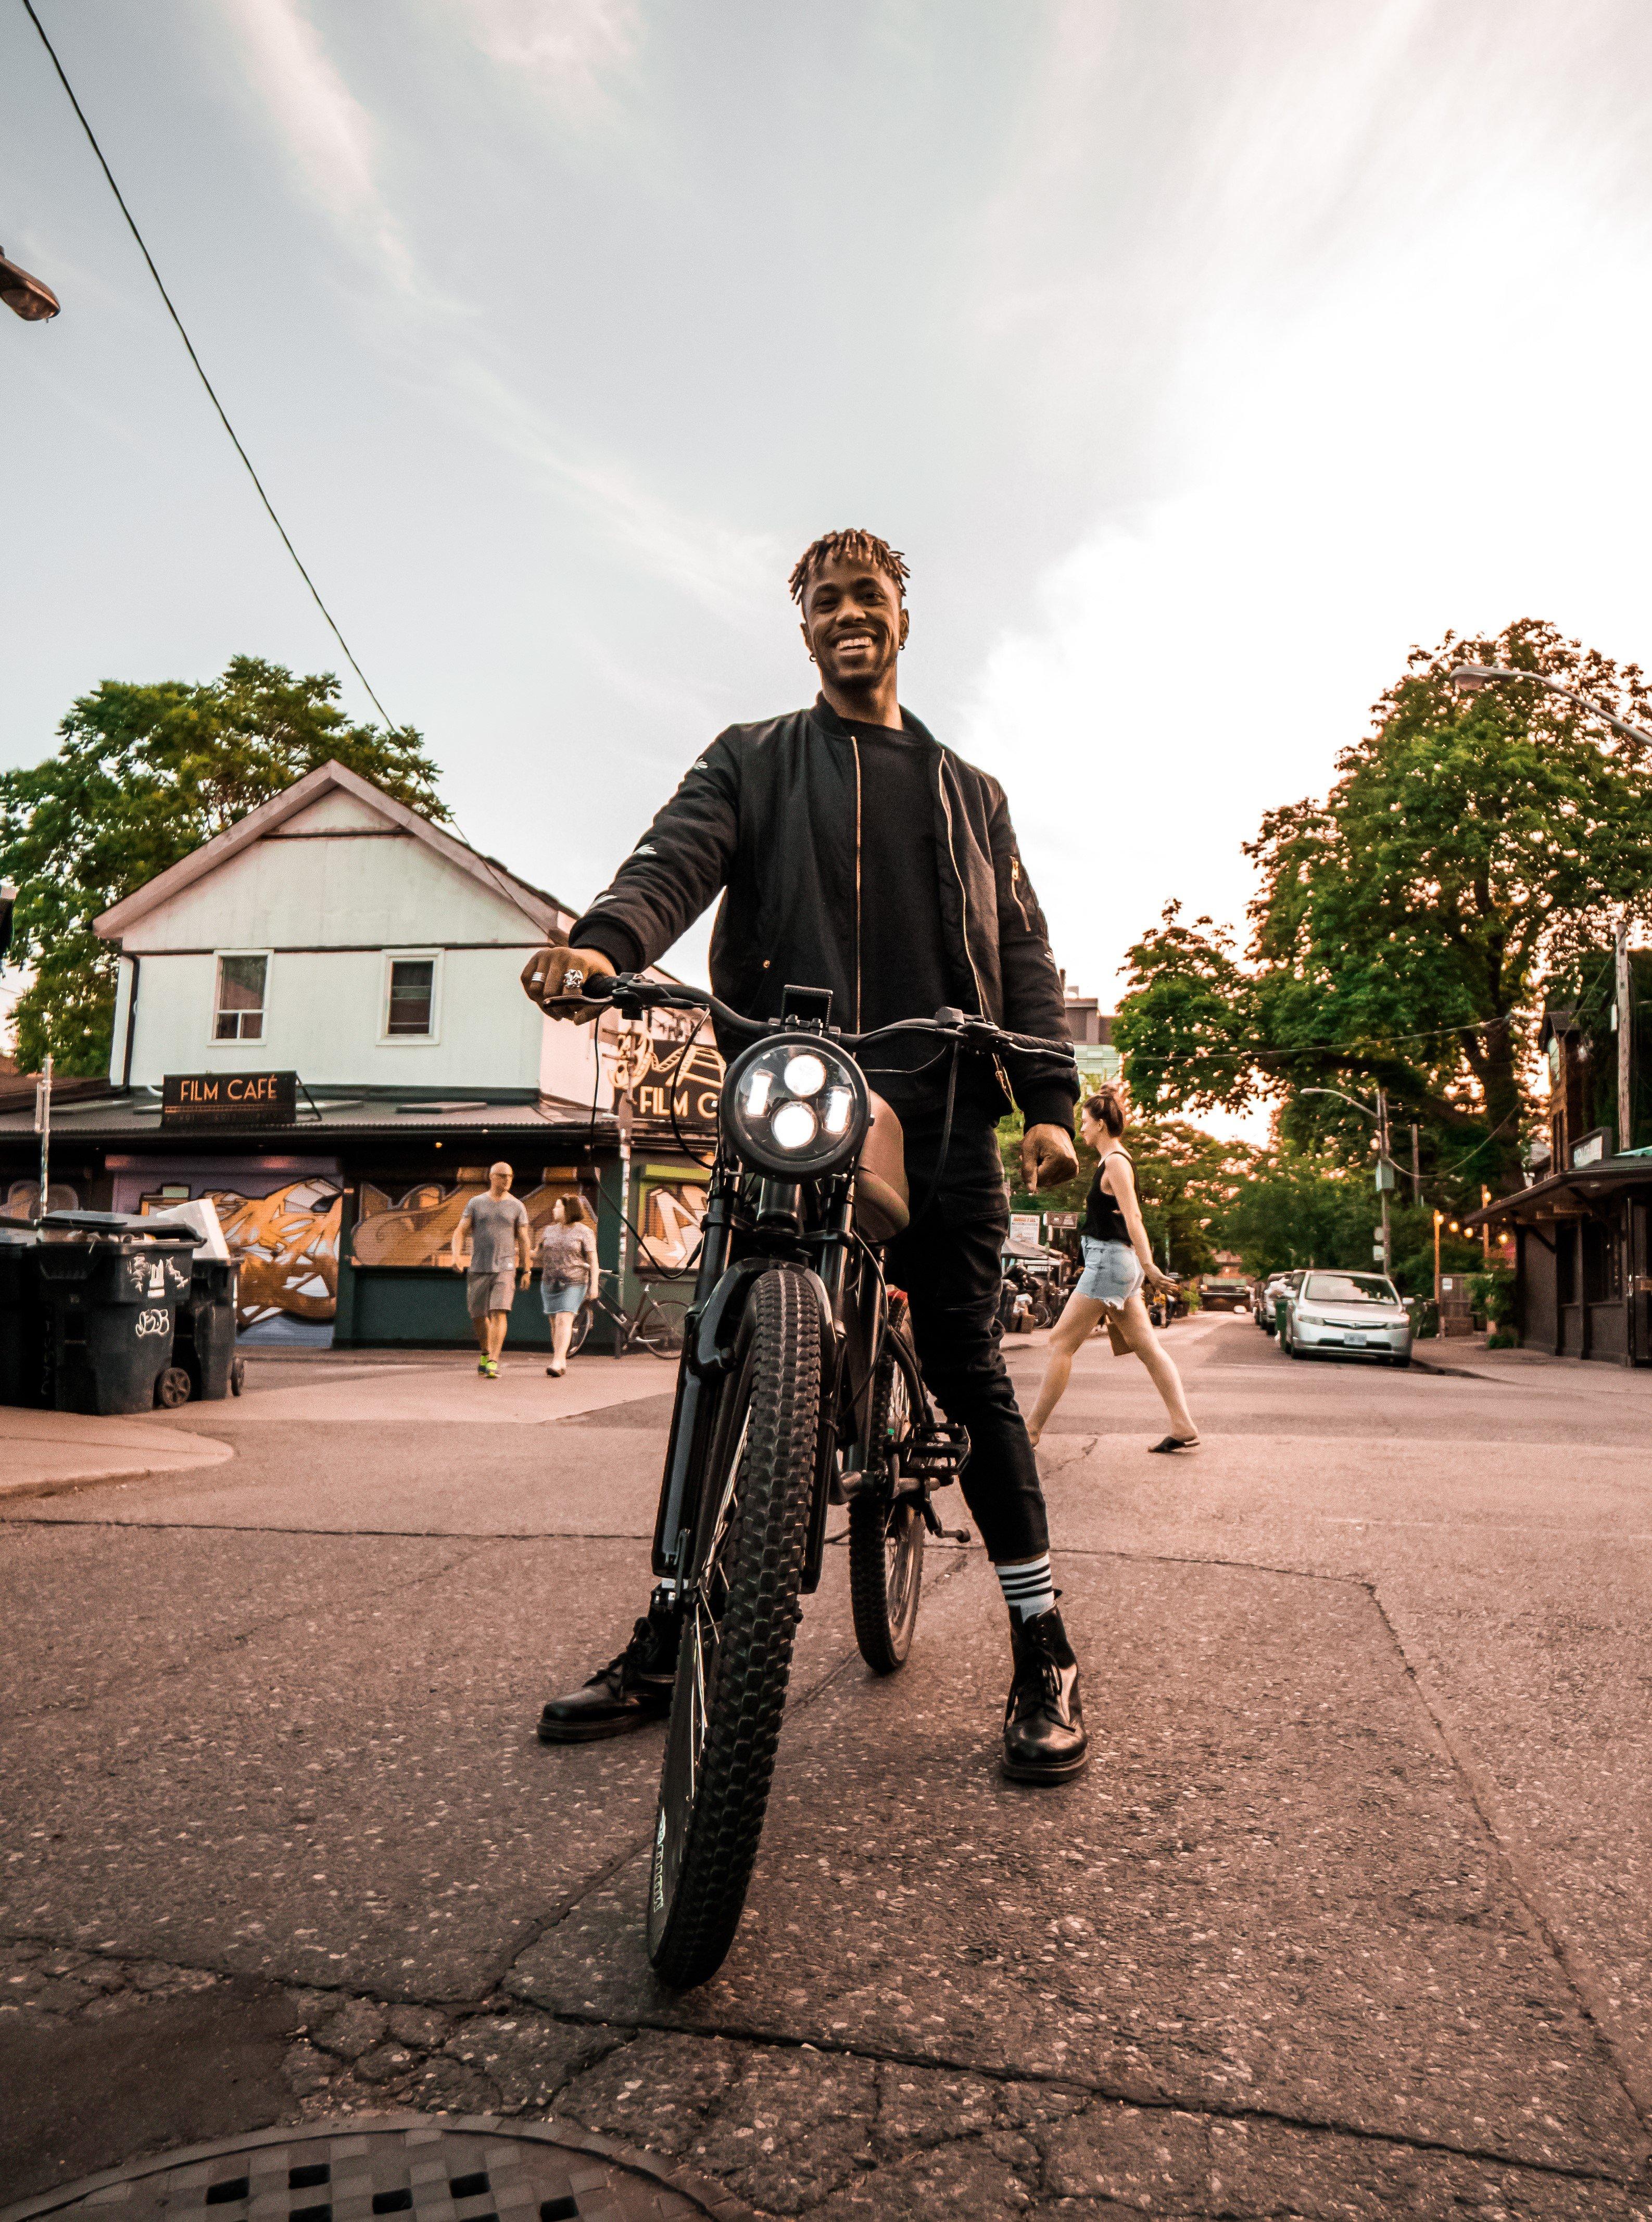 elektrische fiets, e-bike, titan r2, retro brommer, lifestyle